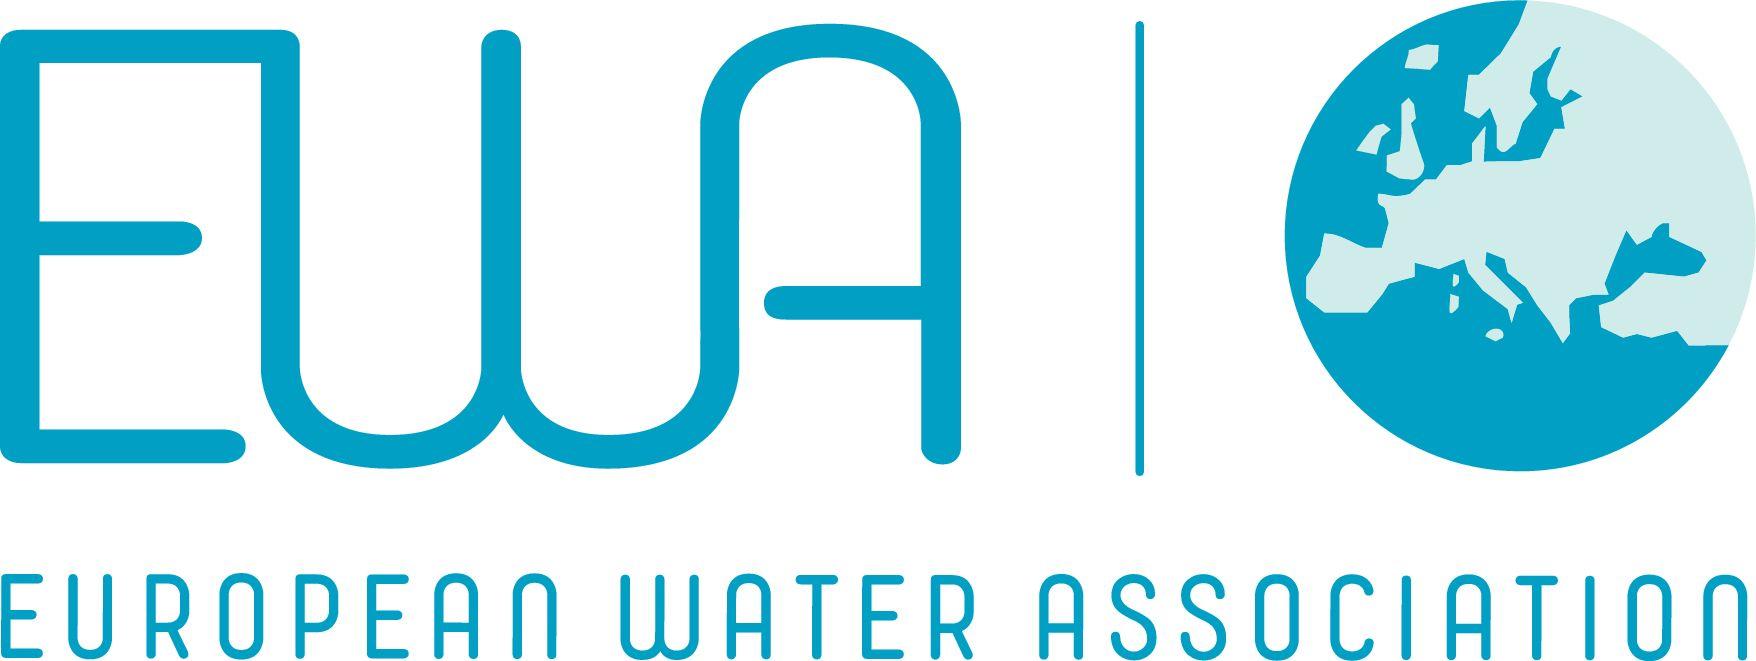 logo for European Water Association